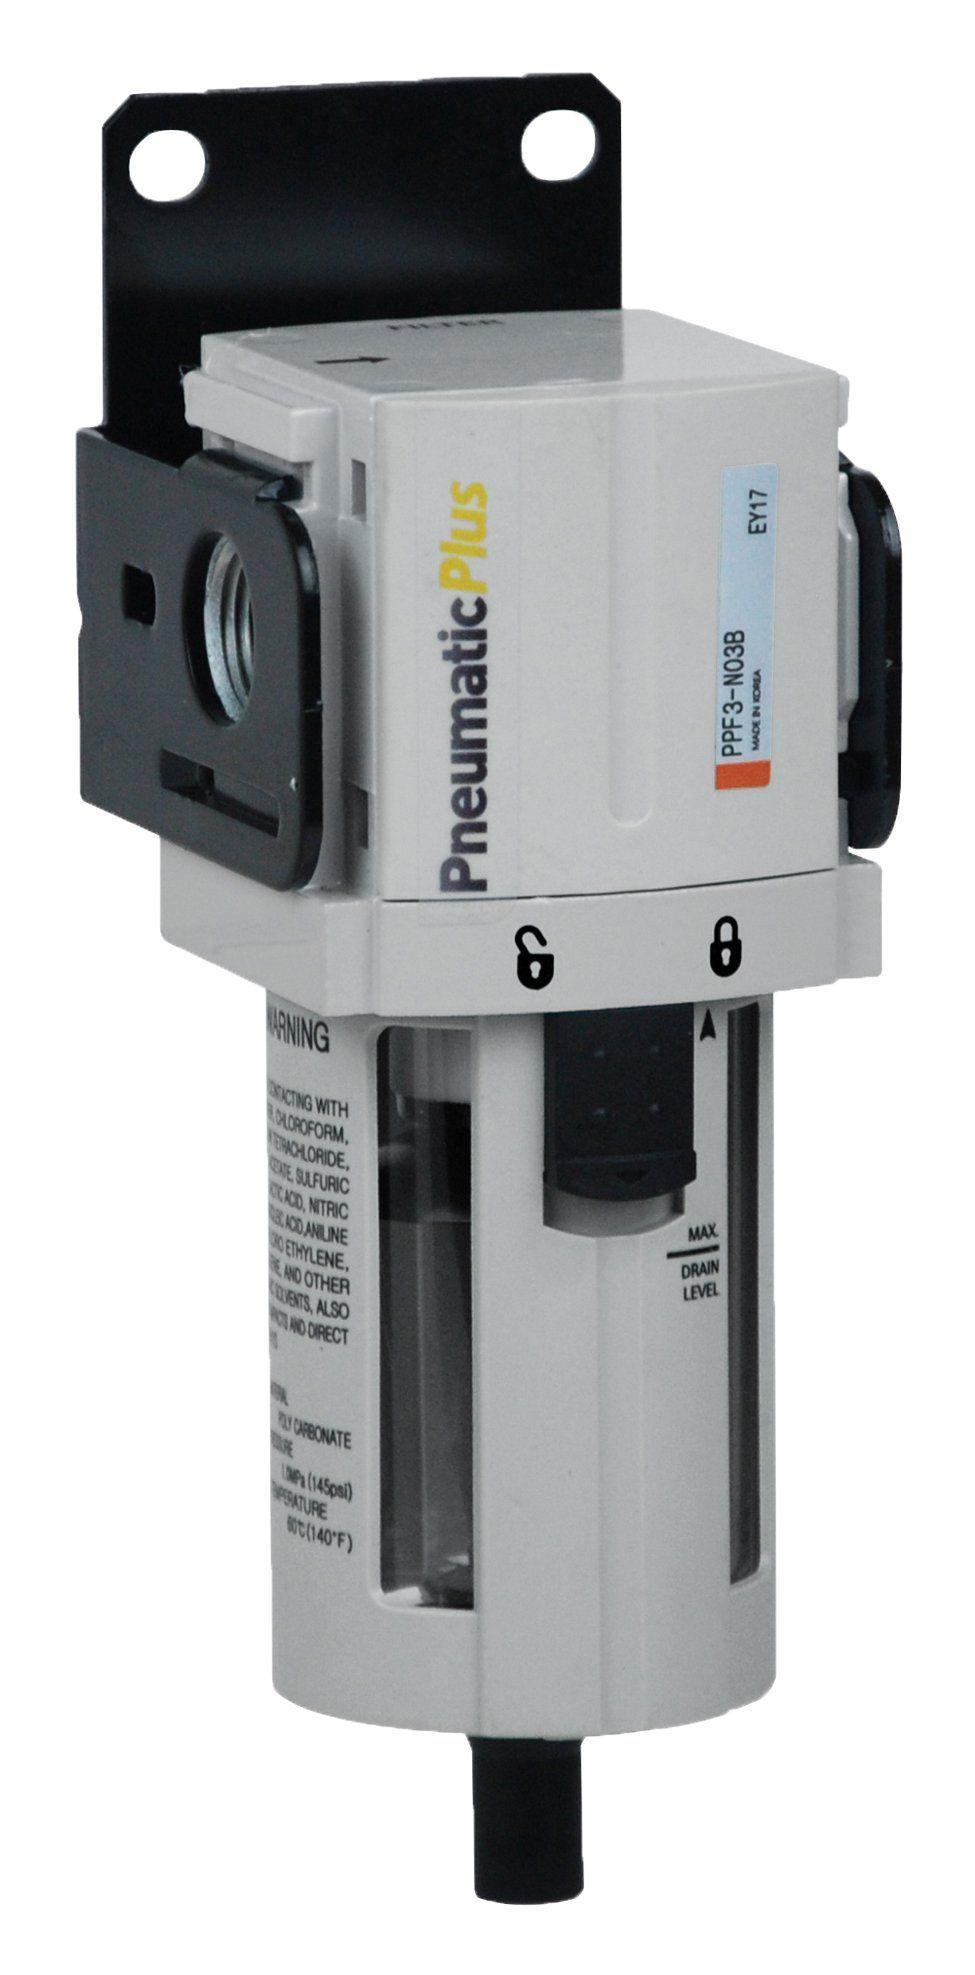 PneumaticPlus PPF3N02B Compressed Air Particulate Filter 1